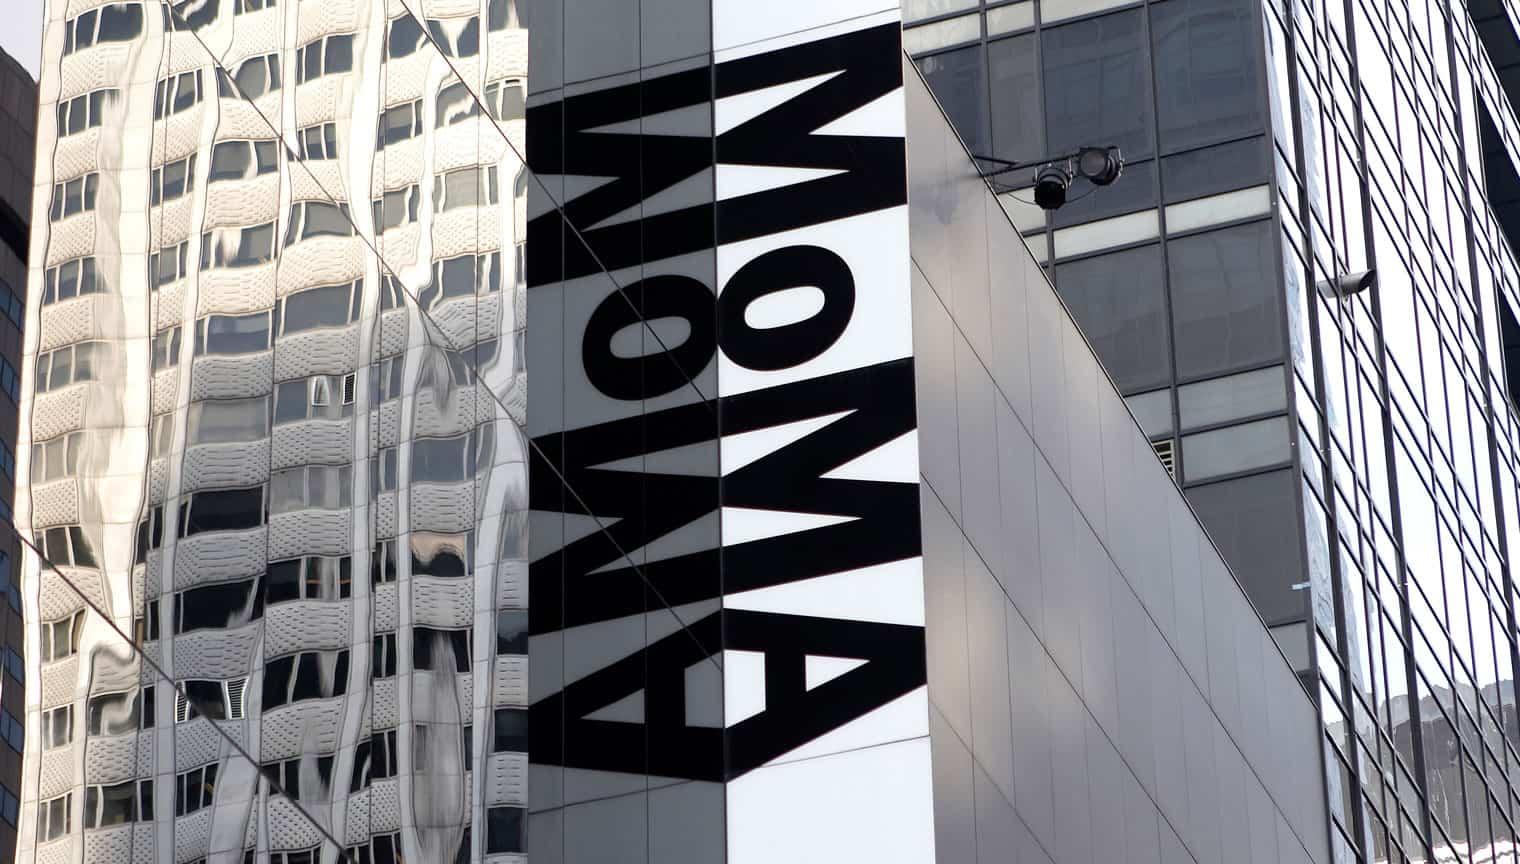 Skip MoMA on Friday – NYC travel tip